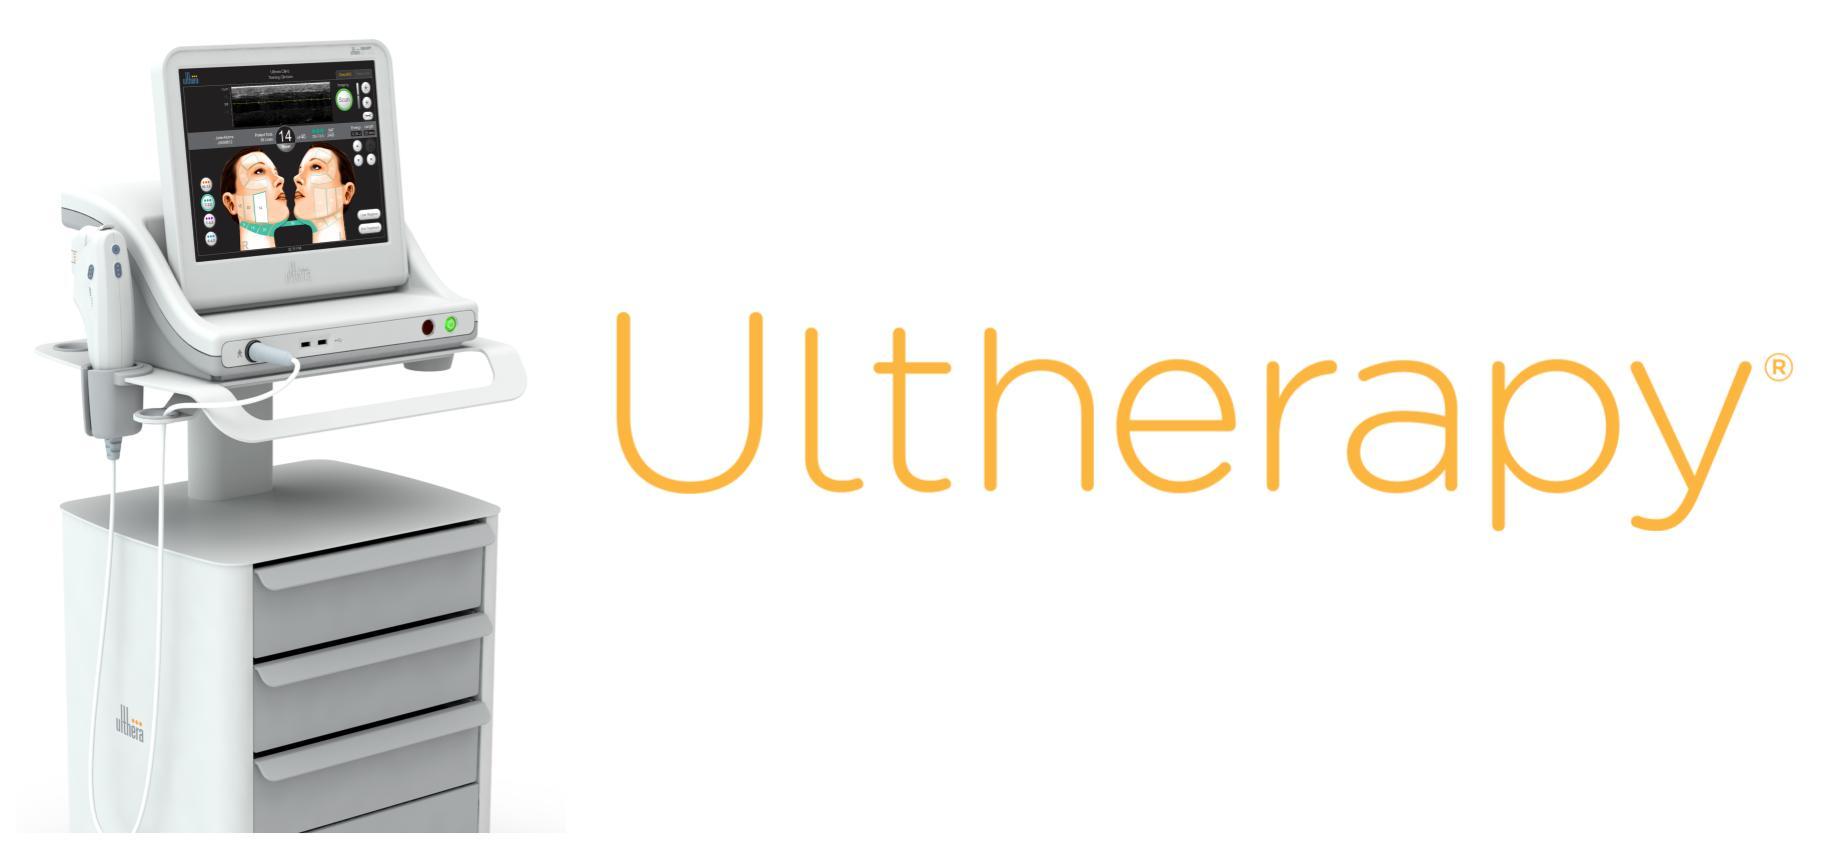 Ultherapy vs HiFu